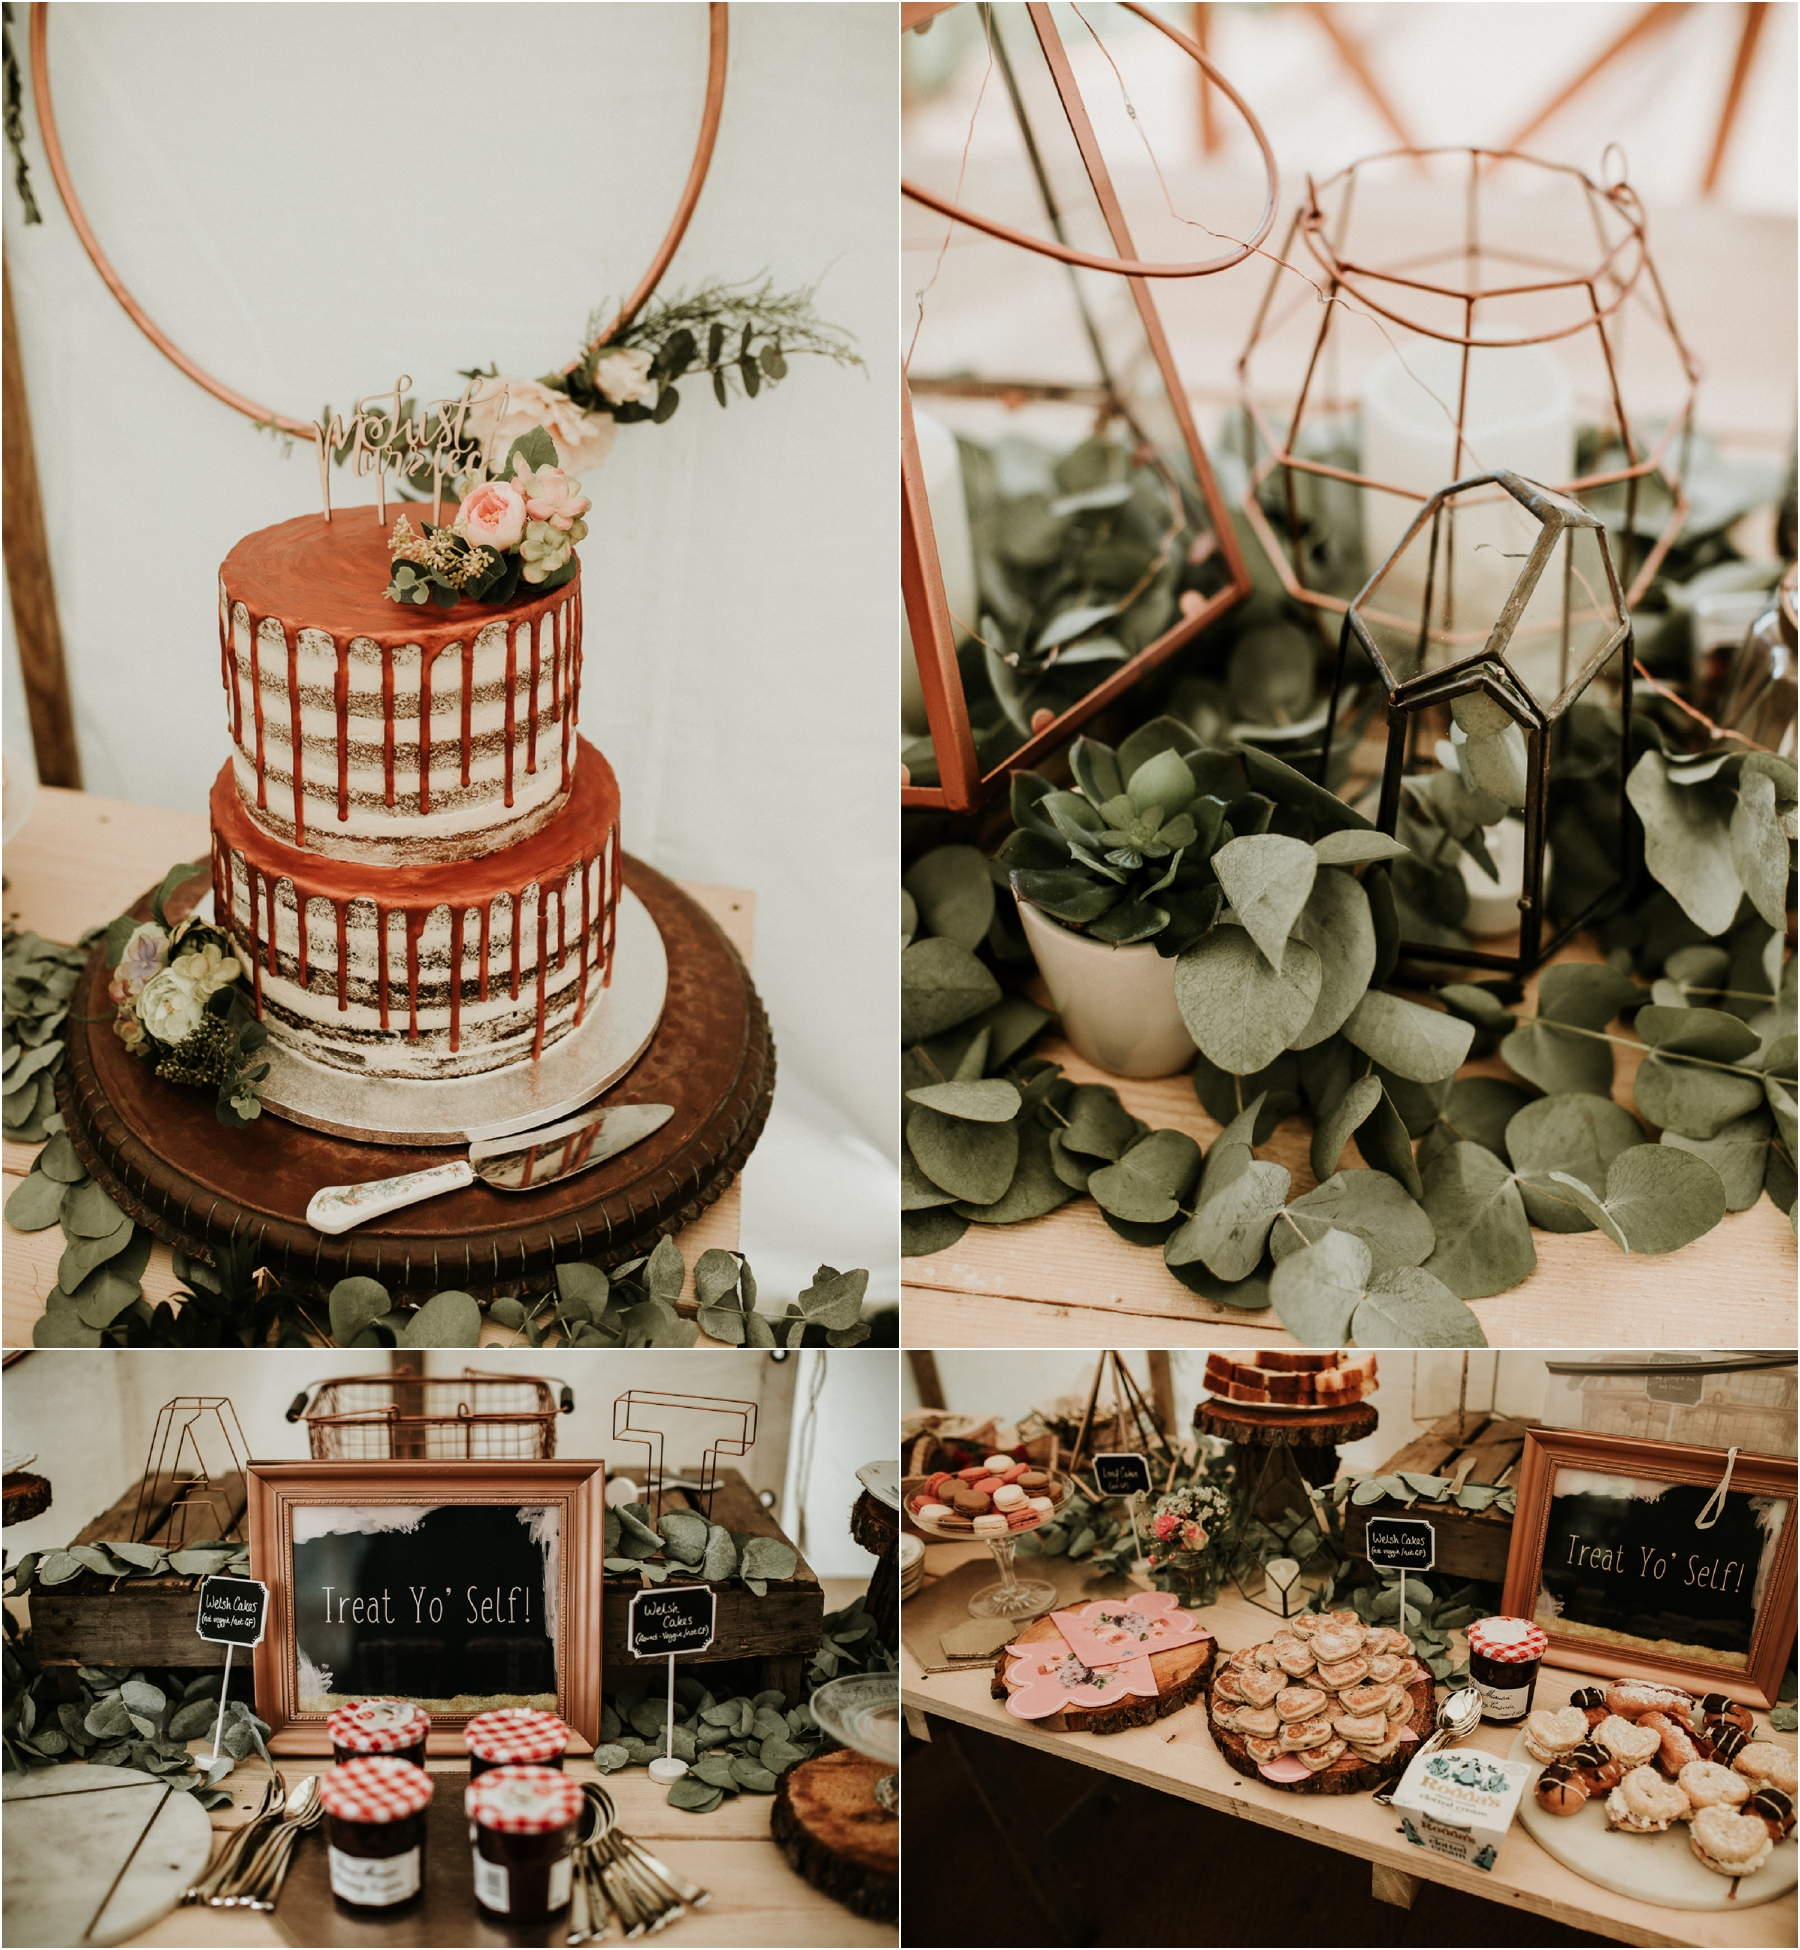 Herefordshire-uk-wedding-photographer_0056.jpg